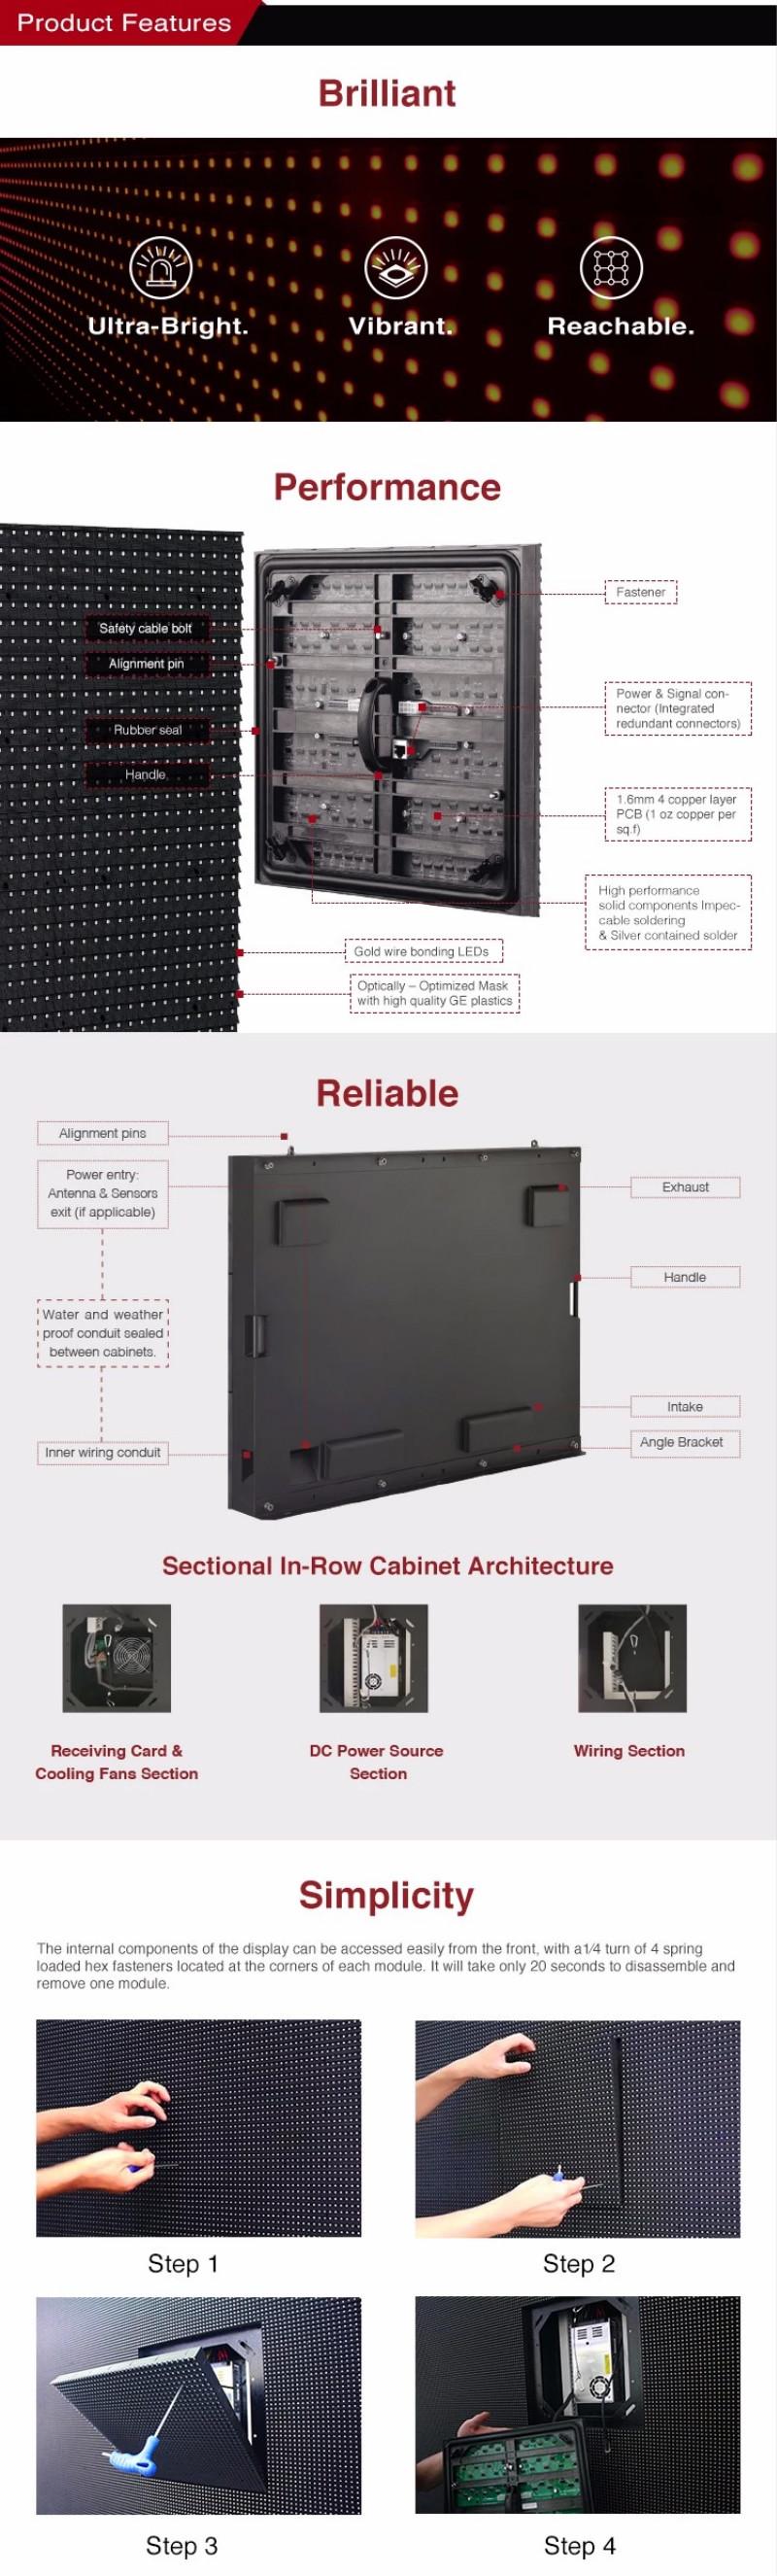 P8 LED Display Screen Details